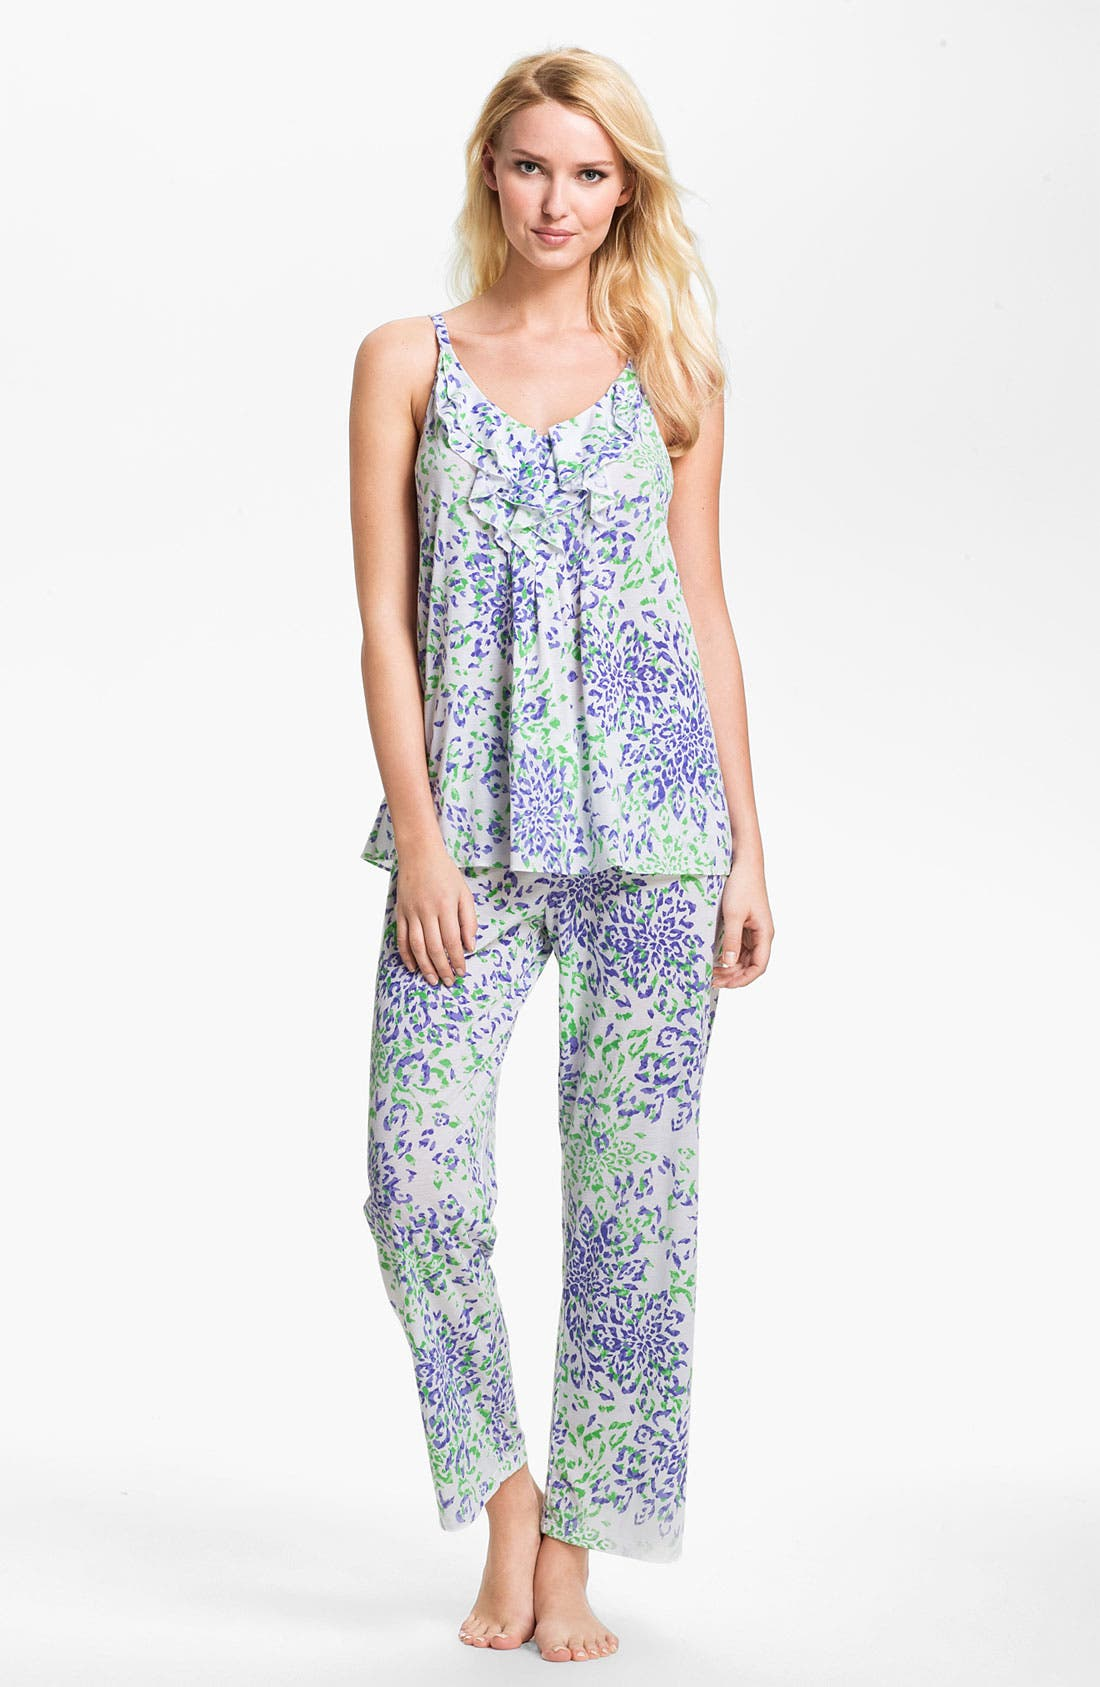 Main Image - Oscar de la Renta Sleepwear 'Animal Blossom' Print Pajamas